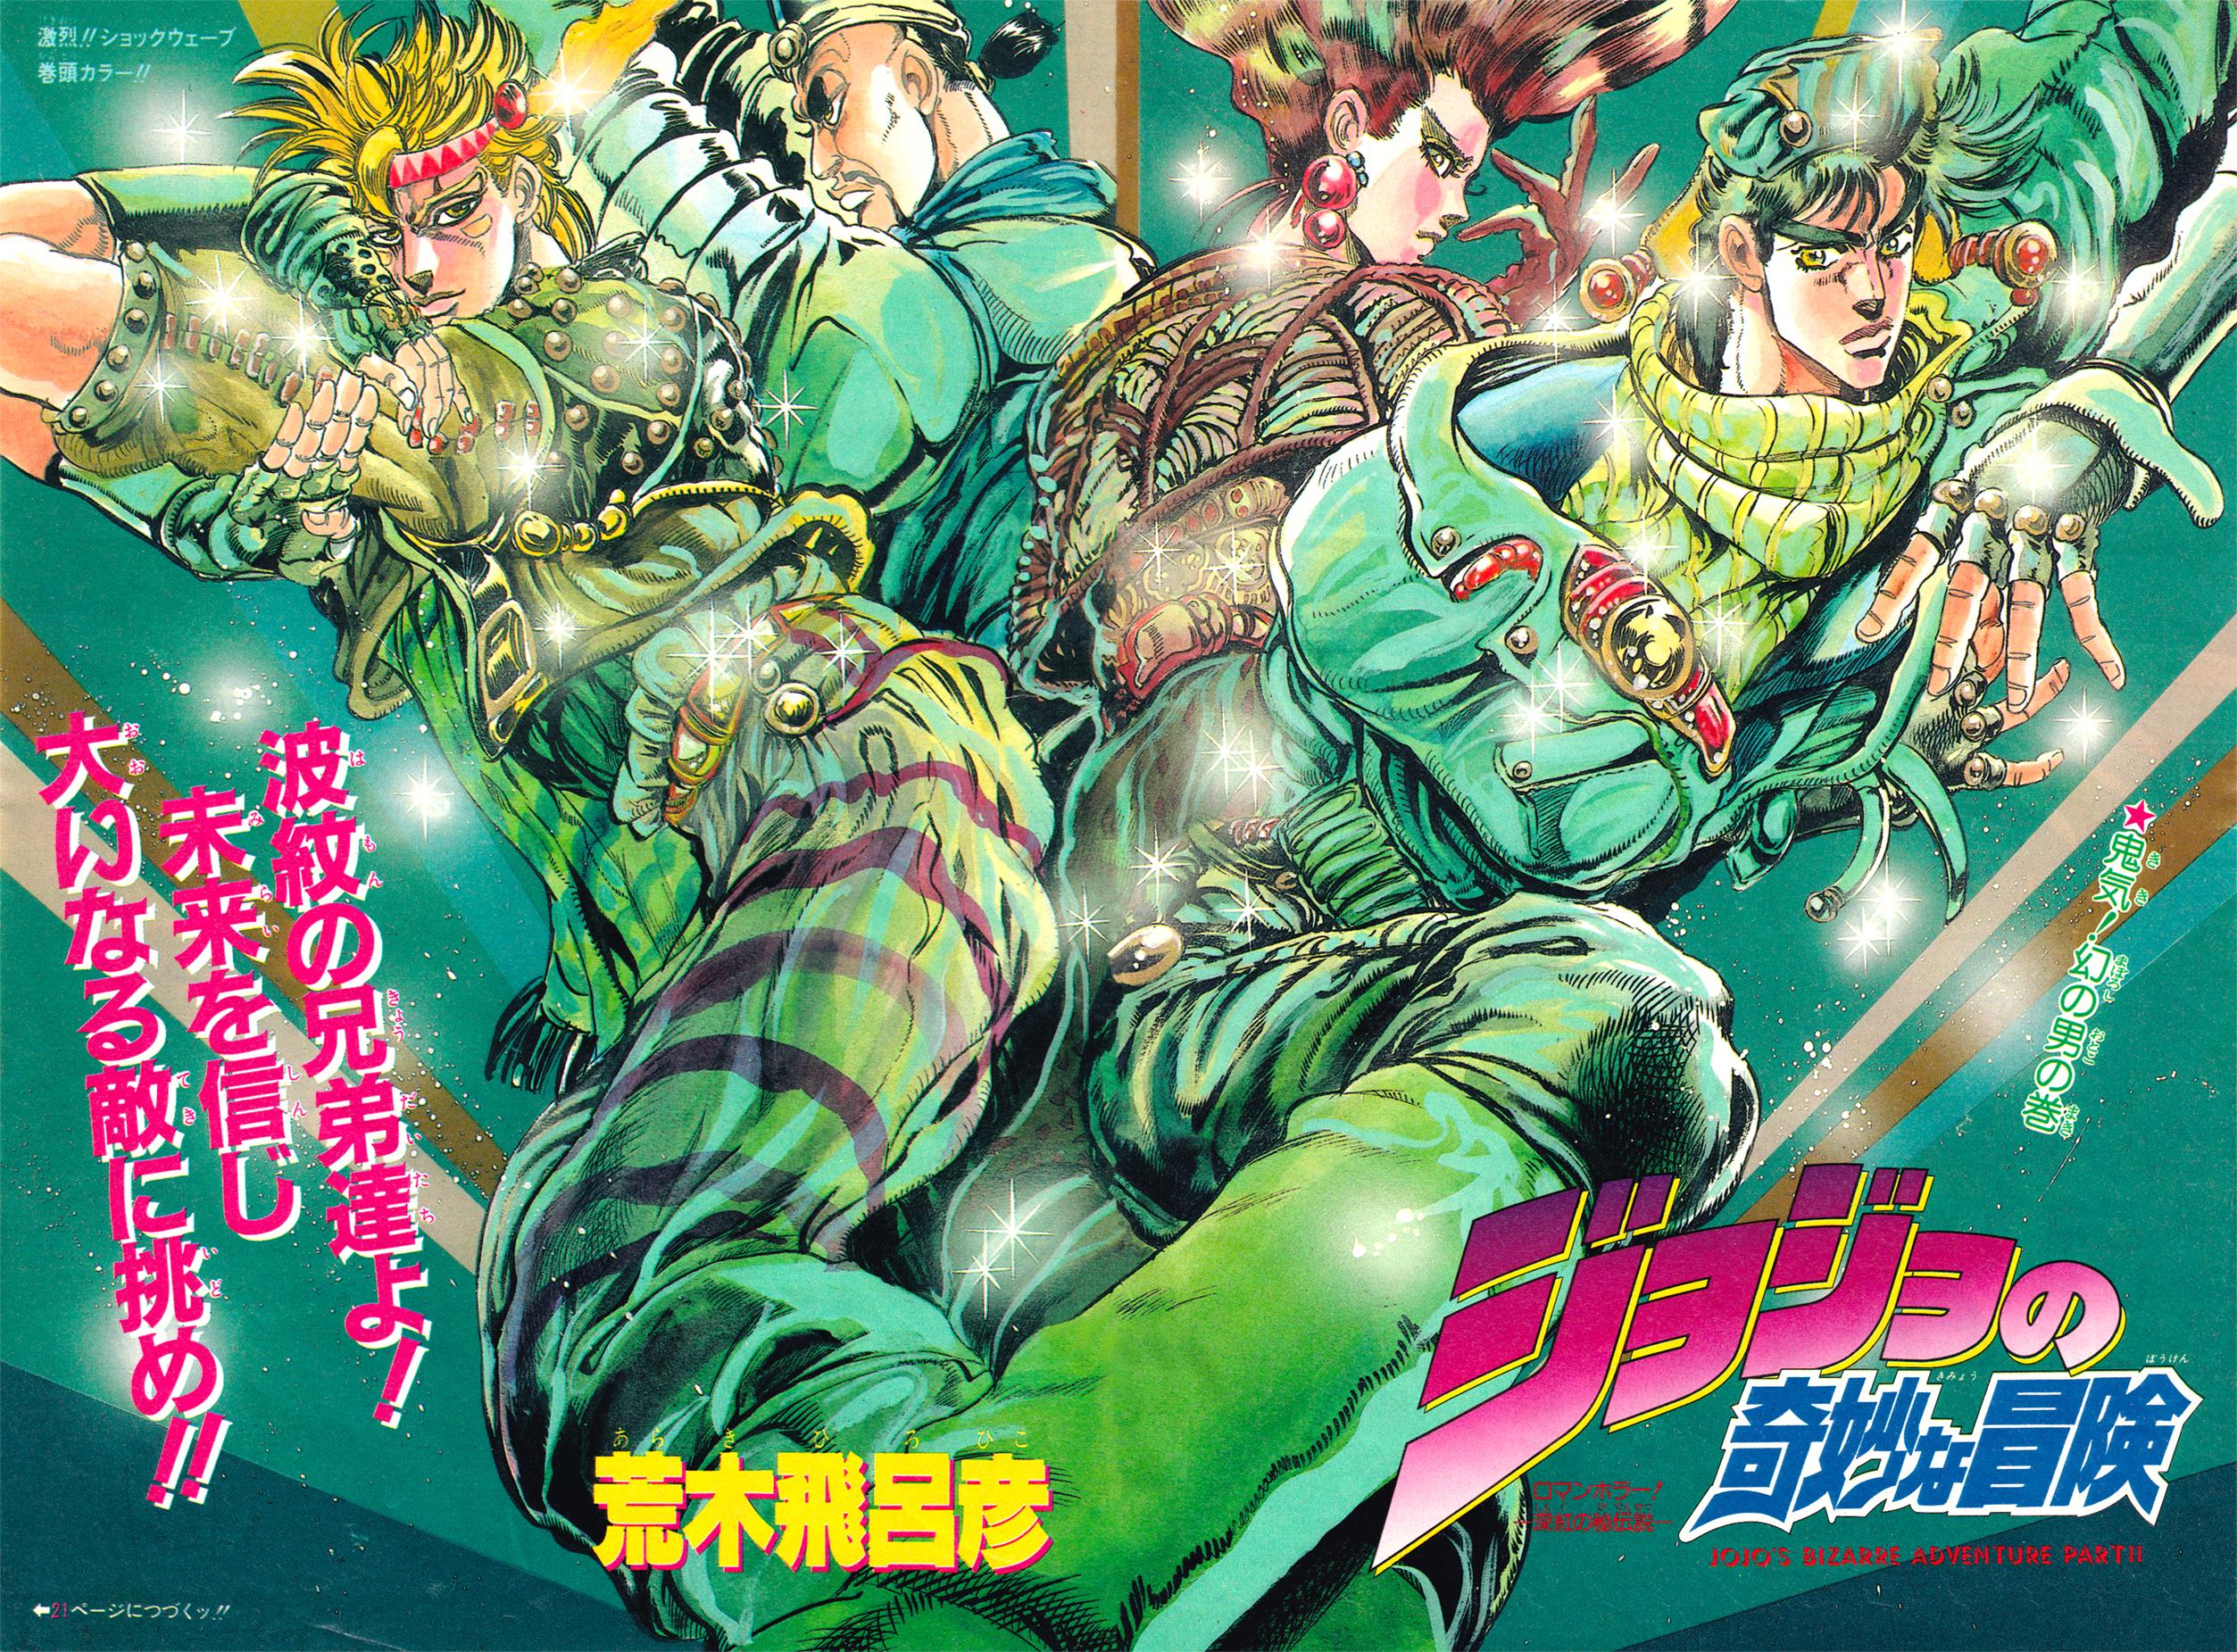 Chapter 90 Magazine Cover B.jpg